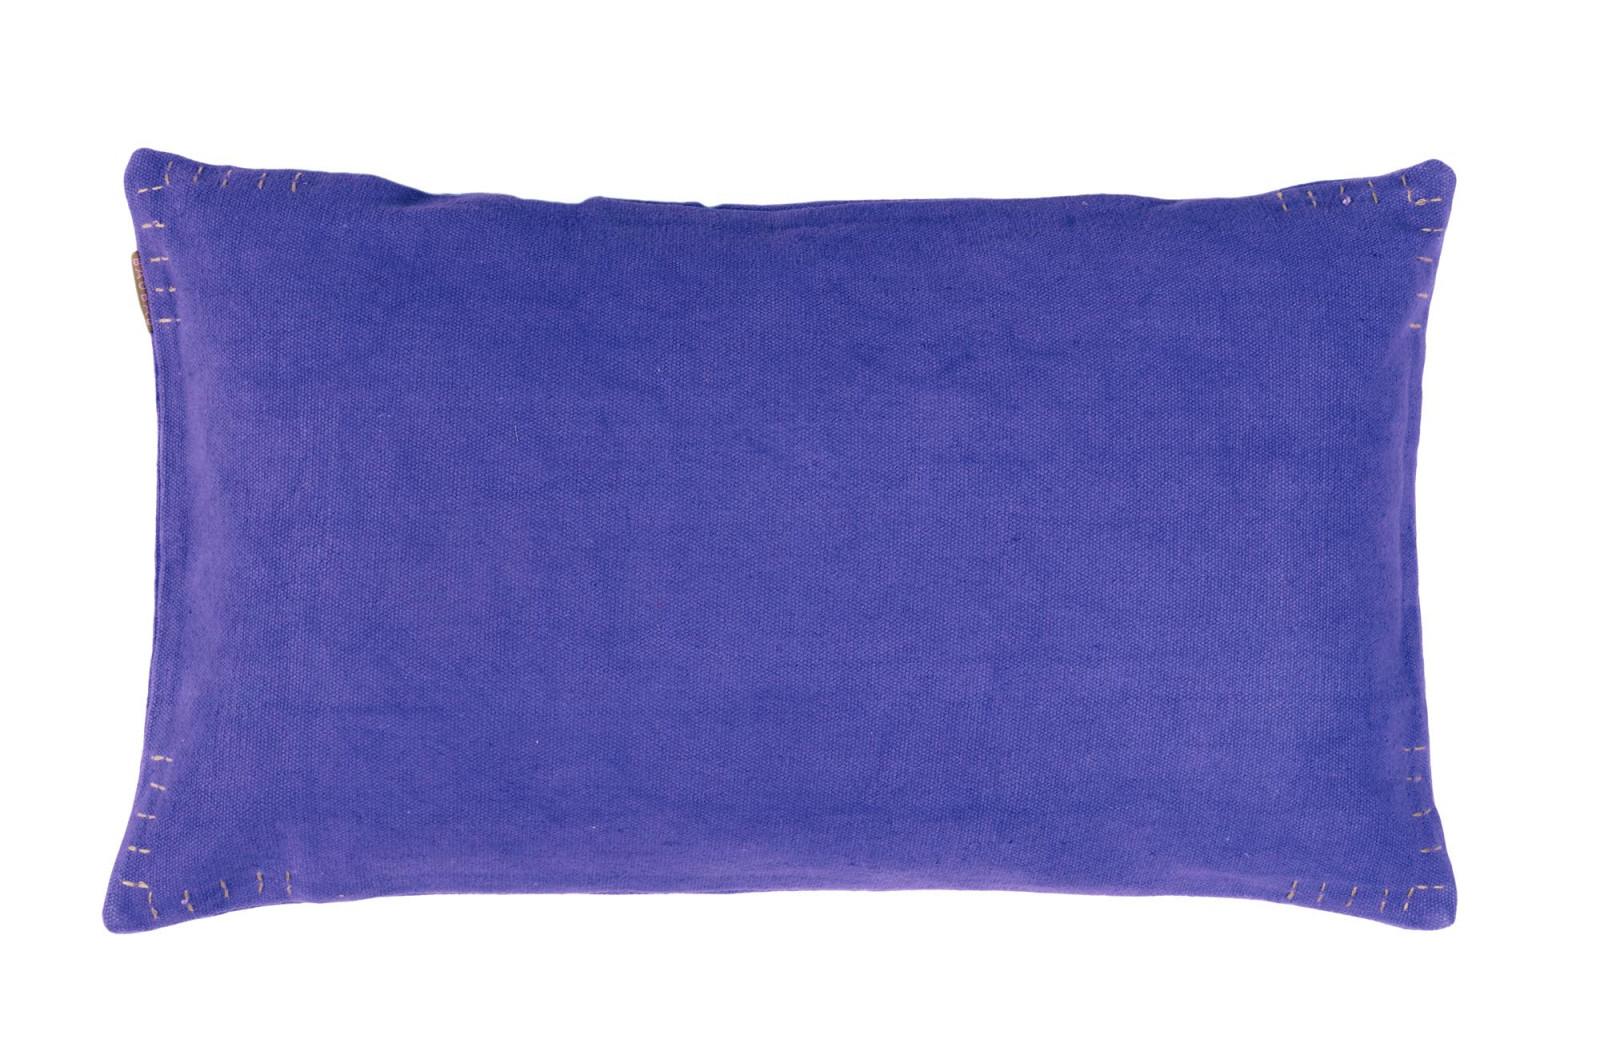 COUSSIN 356 MOMBASSA / violet bleu